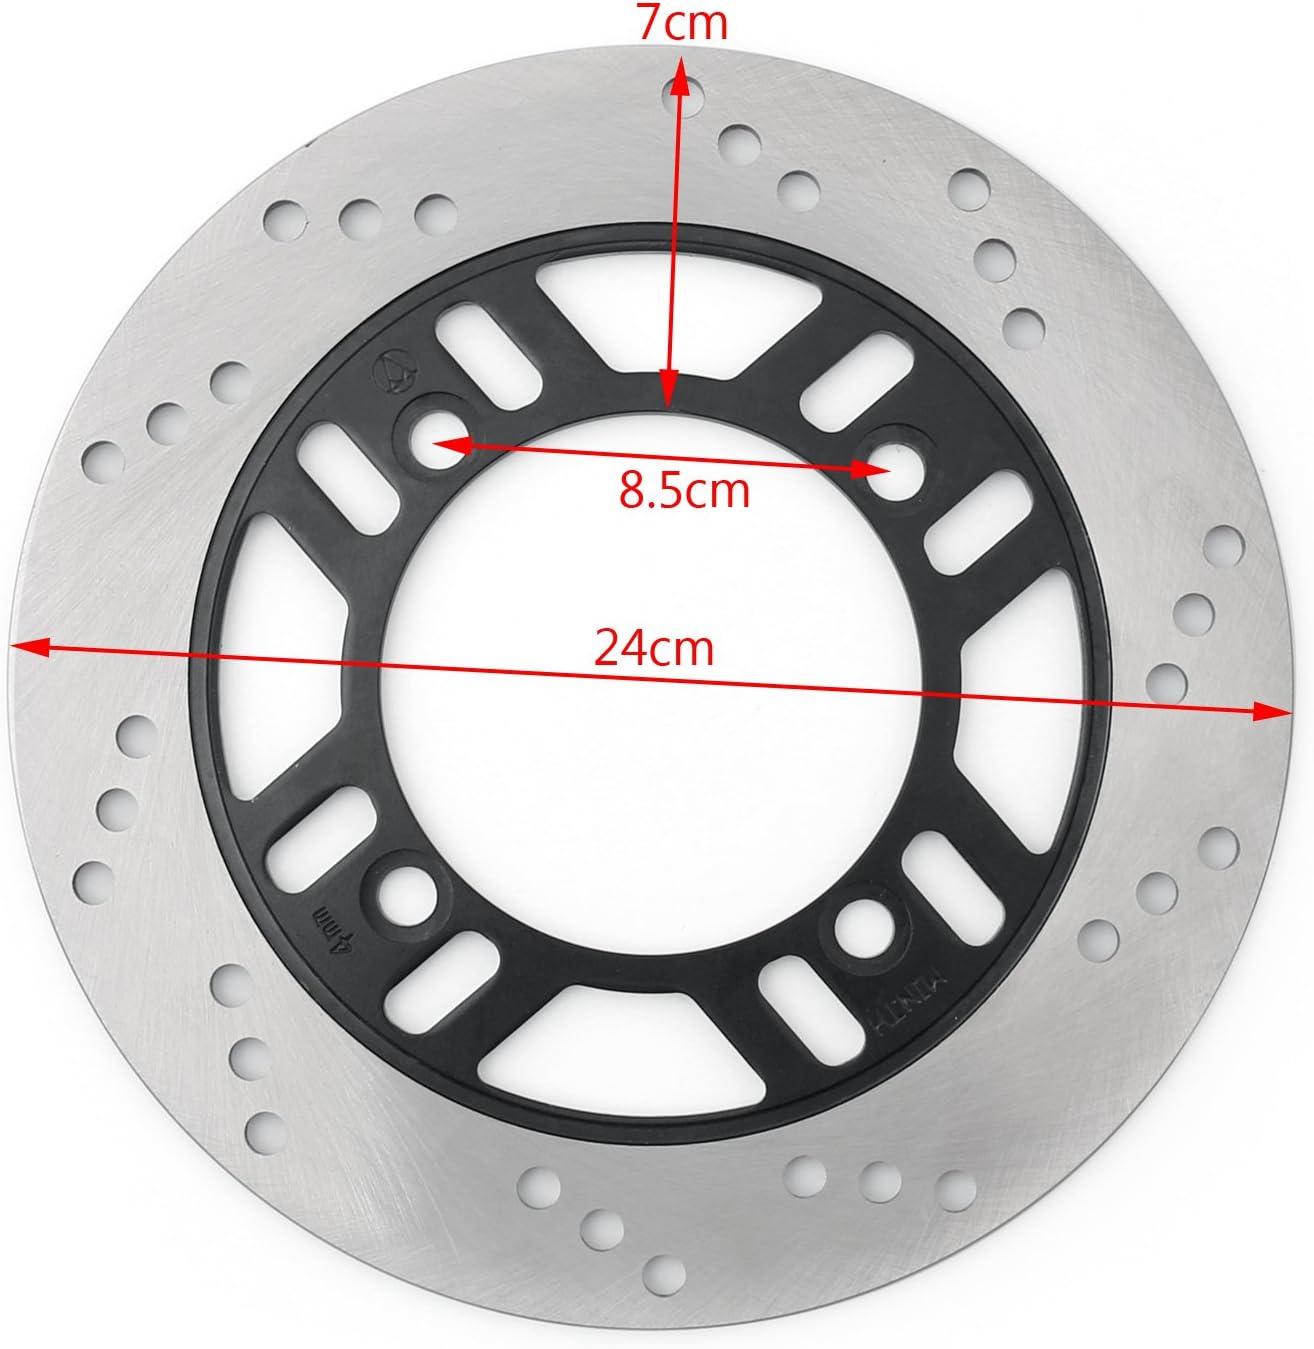 Topteng Rear Disc Brake Rotor for Kawasa-ki ZR550 B2-B6 91-98 ZZR600 E1-E13 ZX600 91-07